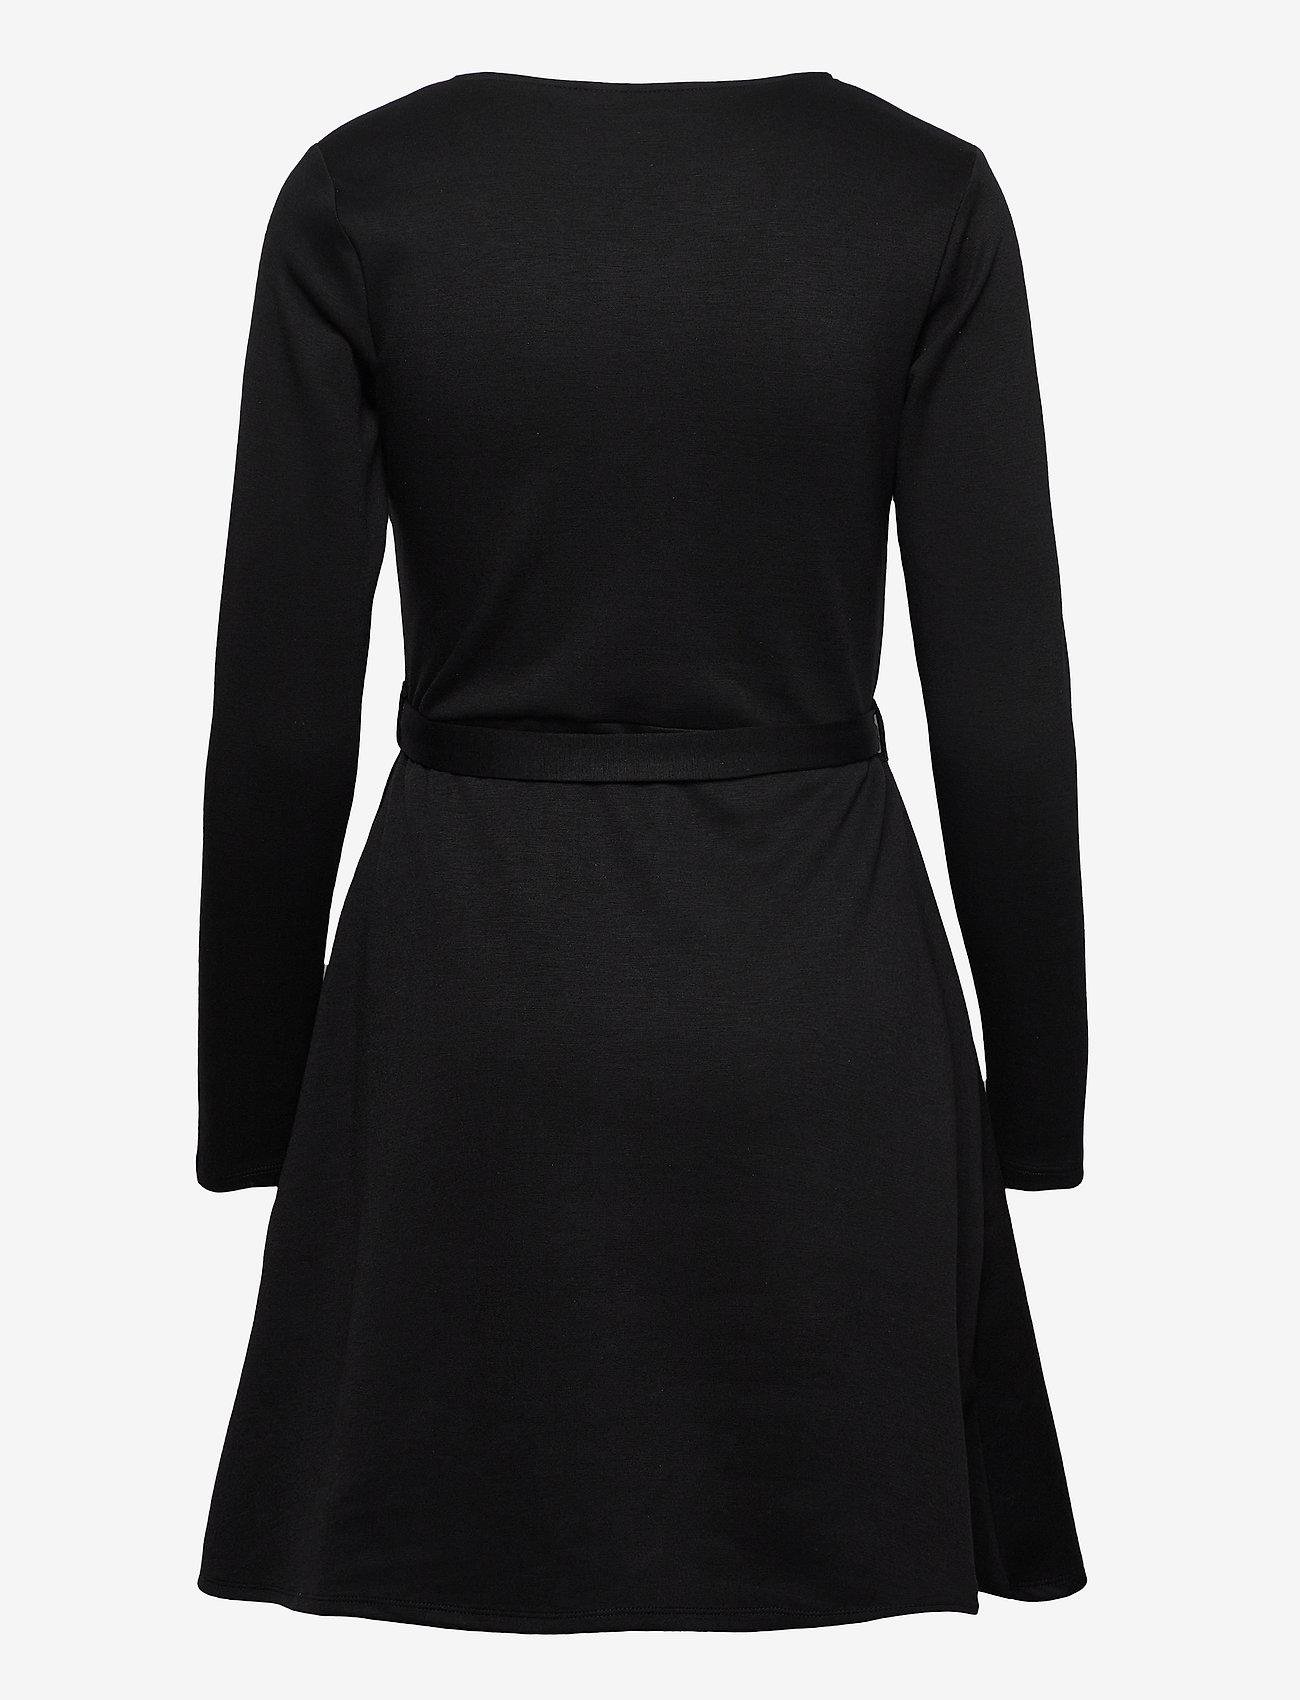 Object - OBJSAVA L/S V-NECK DRESS - everyday dresses - black - 1